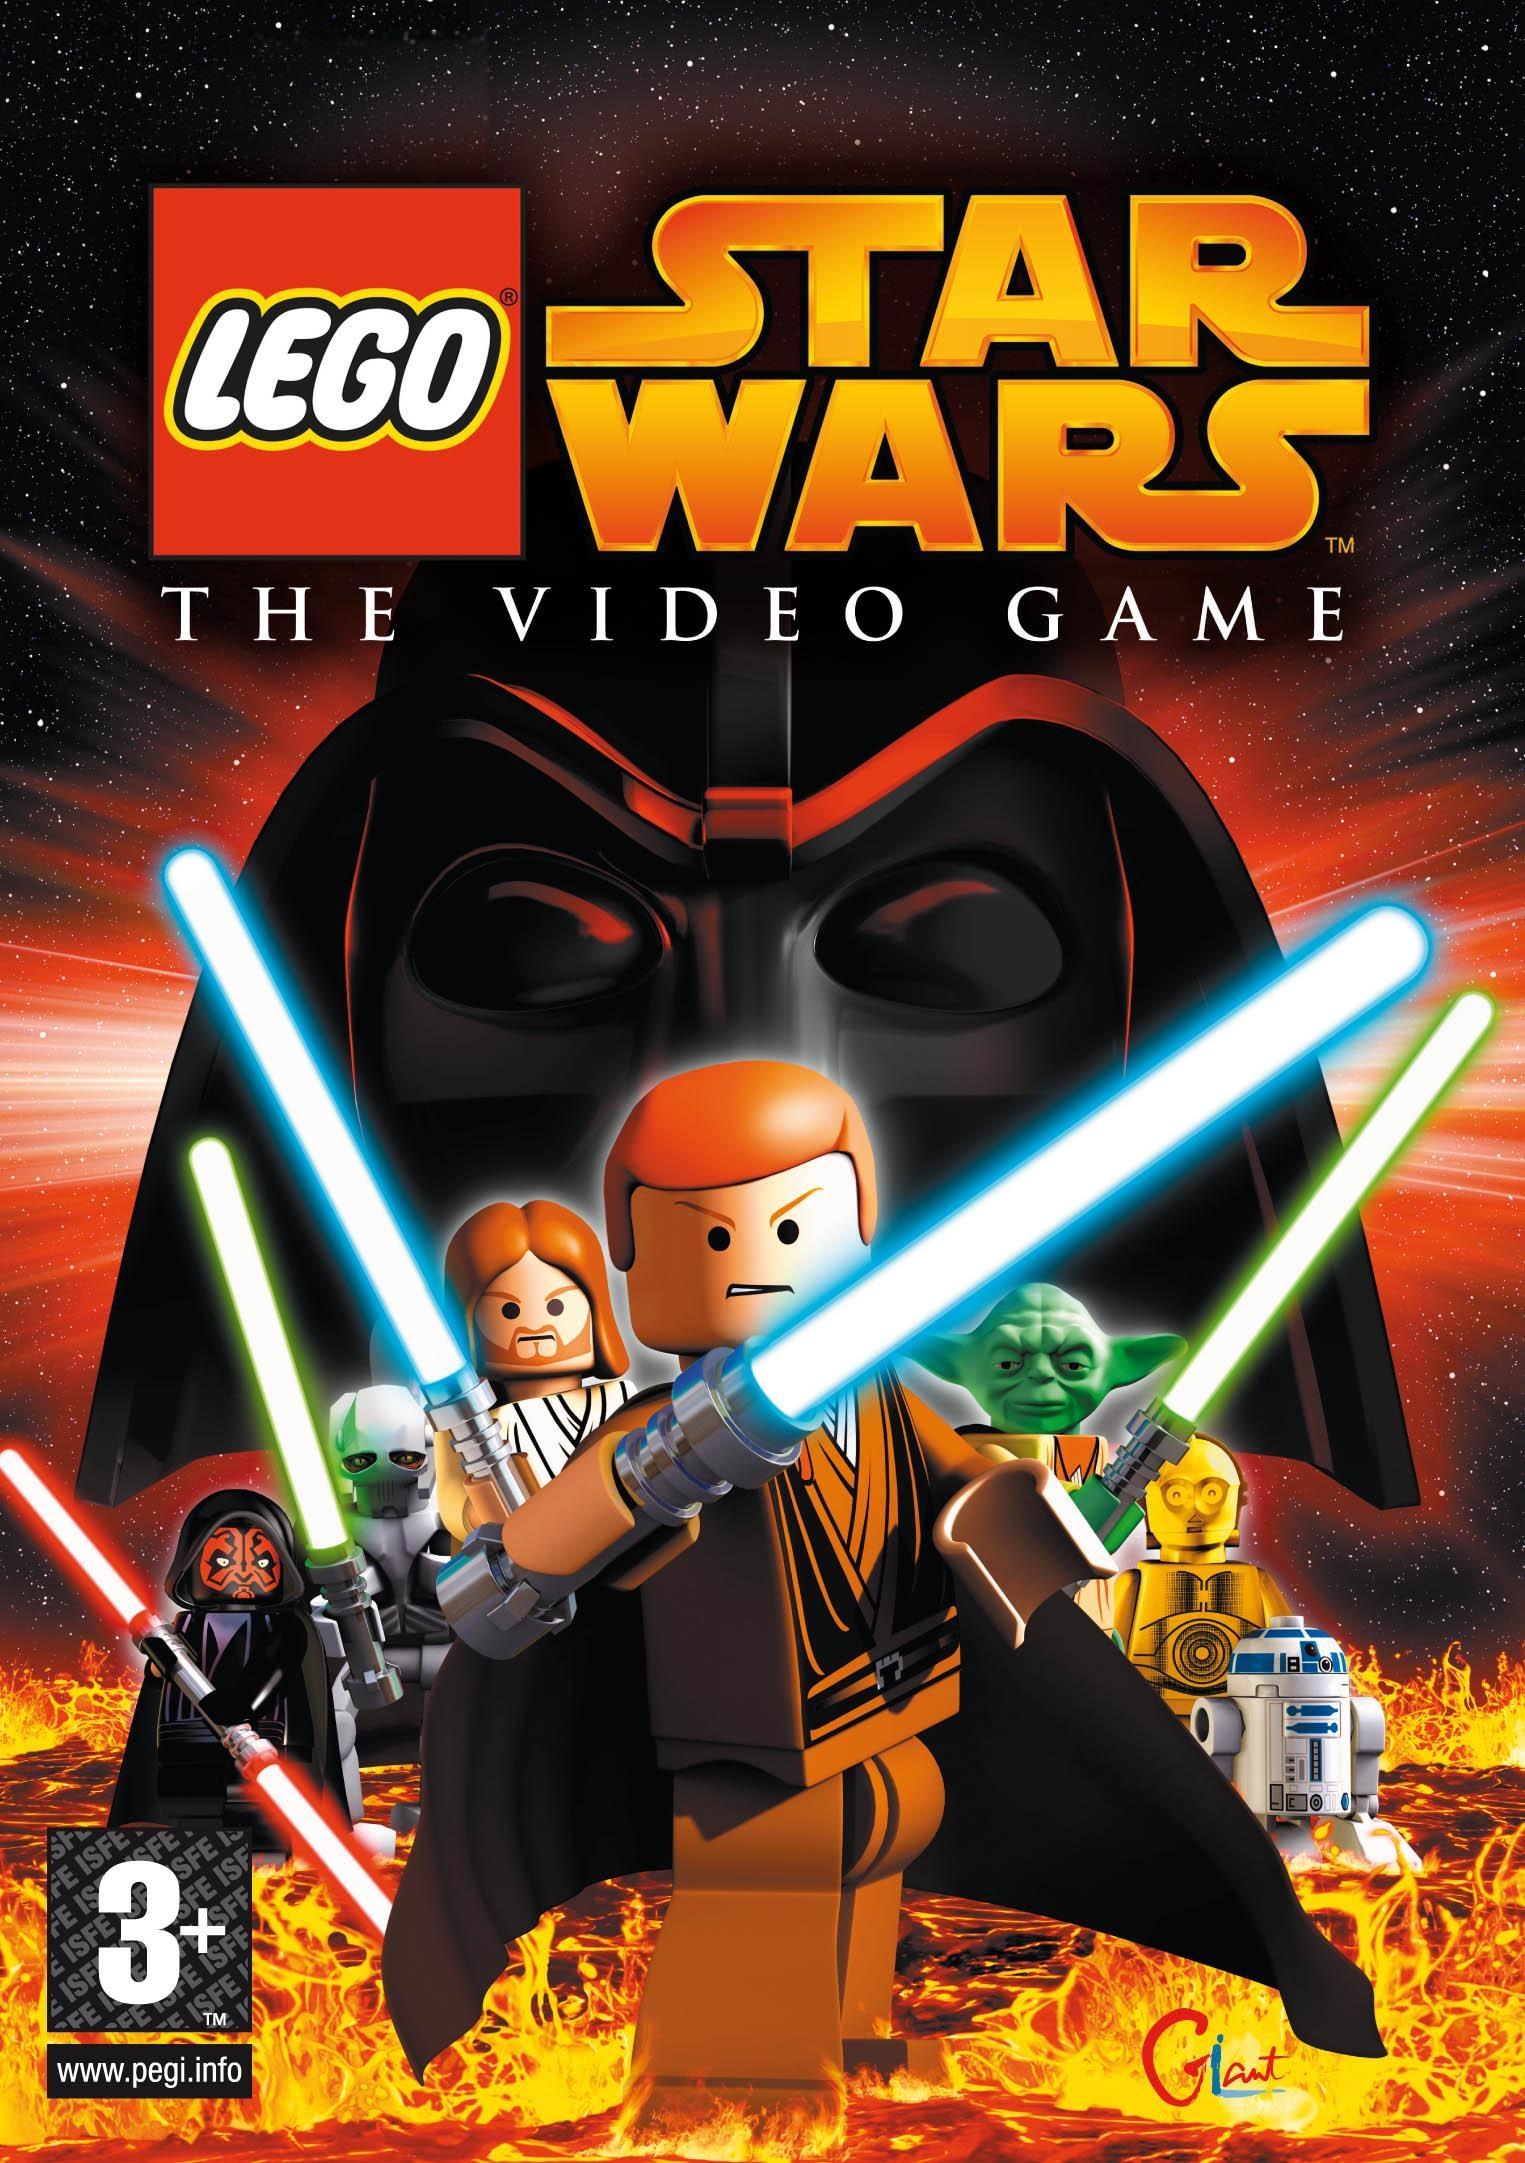 Lego star wars el videojuego wiki videojuegos lego fandom powered by wikia - Croiseur interstellaire star wars lego ...